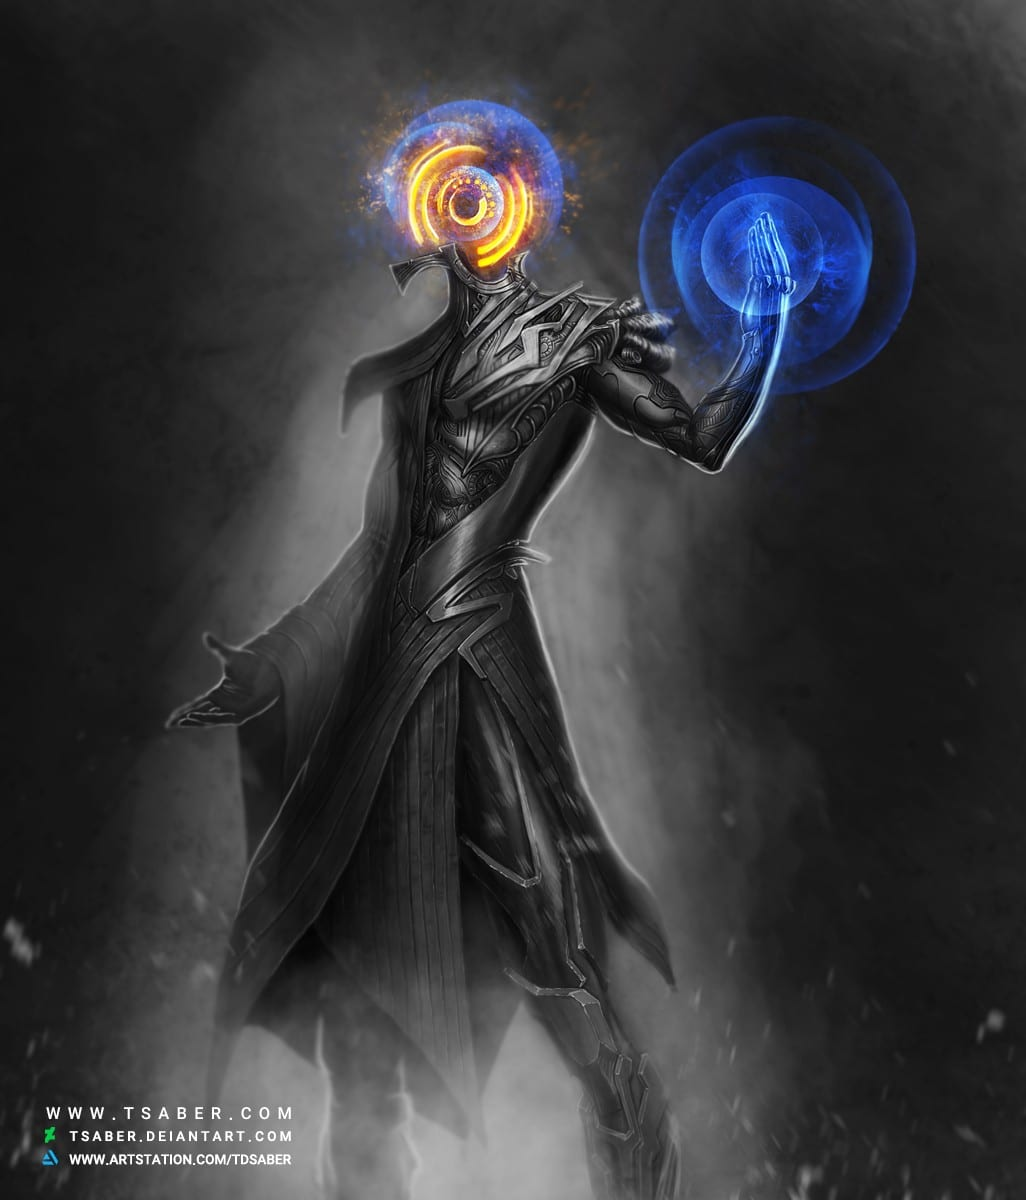 Justice - Scifi Robot Character Design Artwork - Tsaber